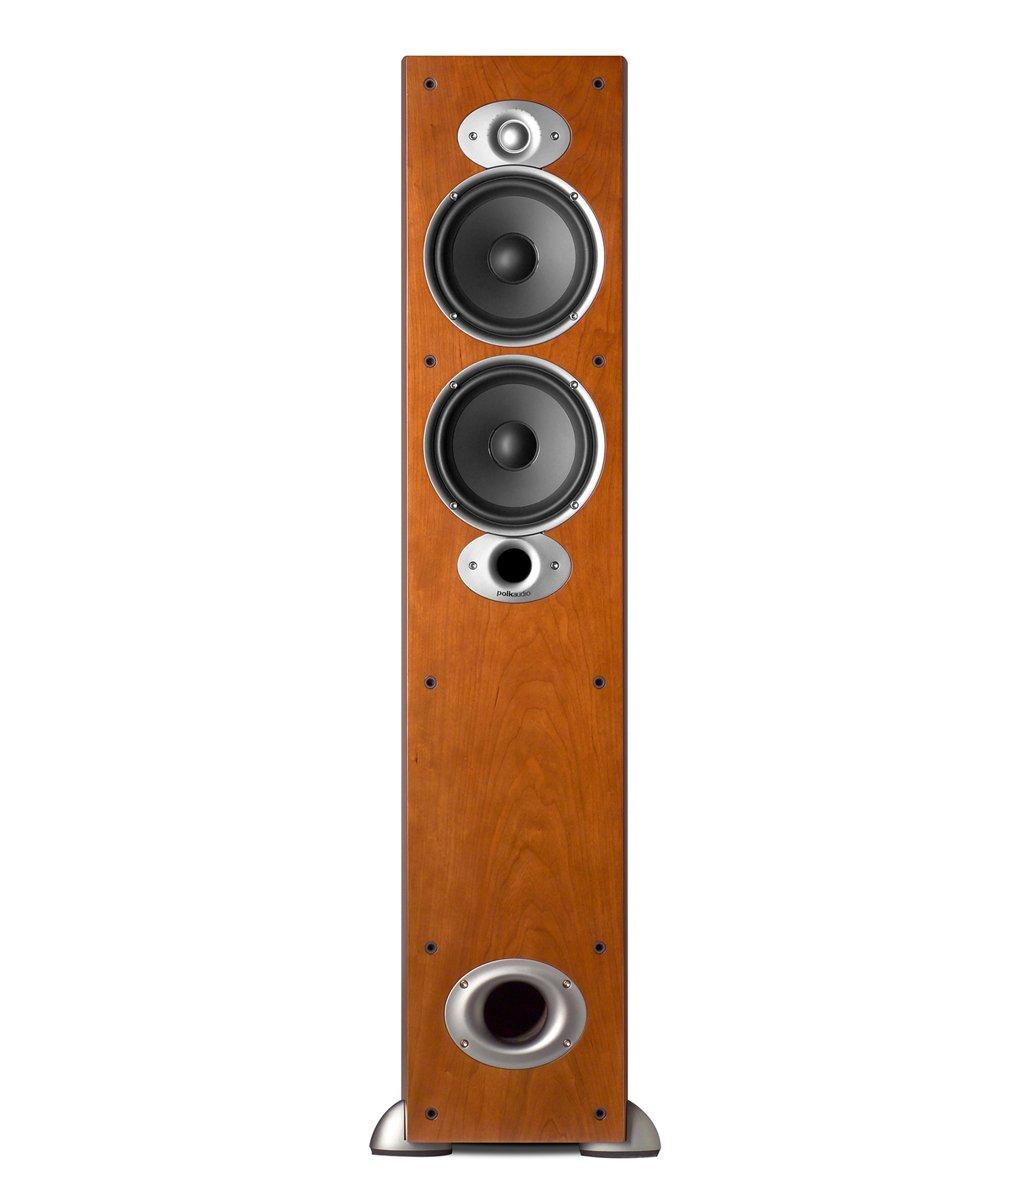 Polk Audio RTI A5 Floorstanding Speaker (Single, Cherry) by Polk Audio